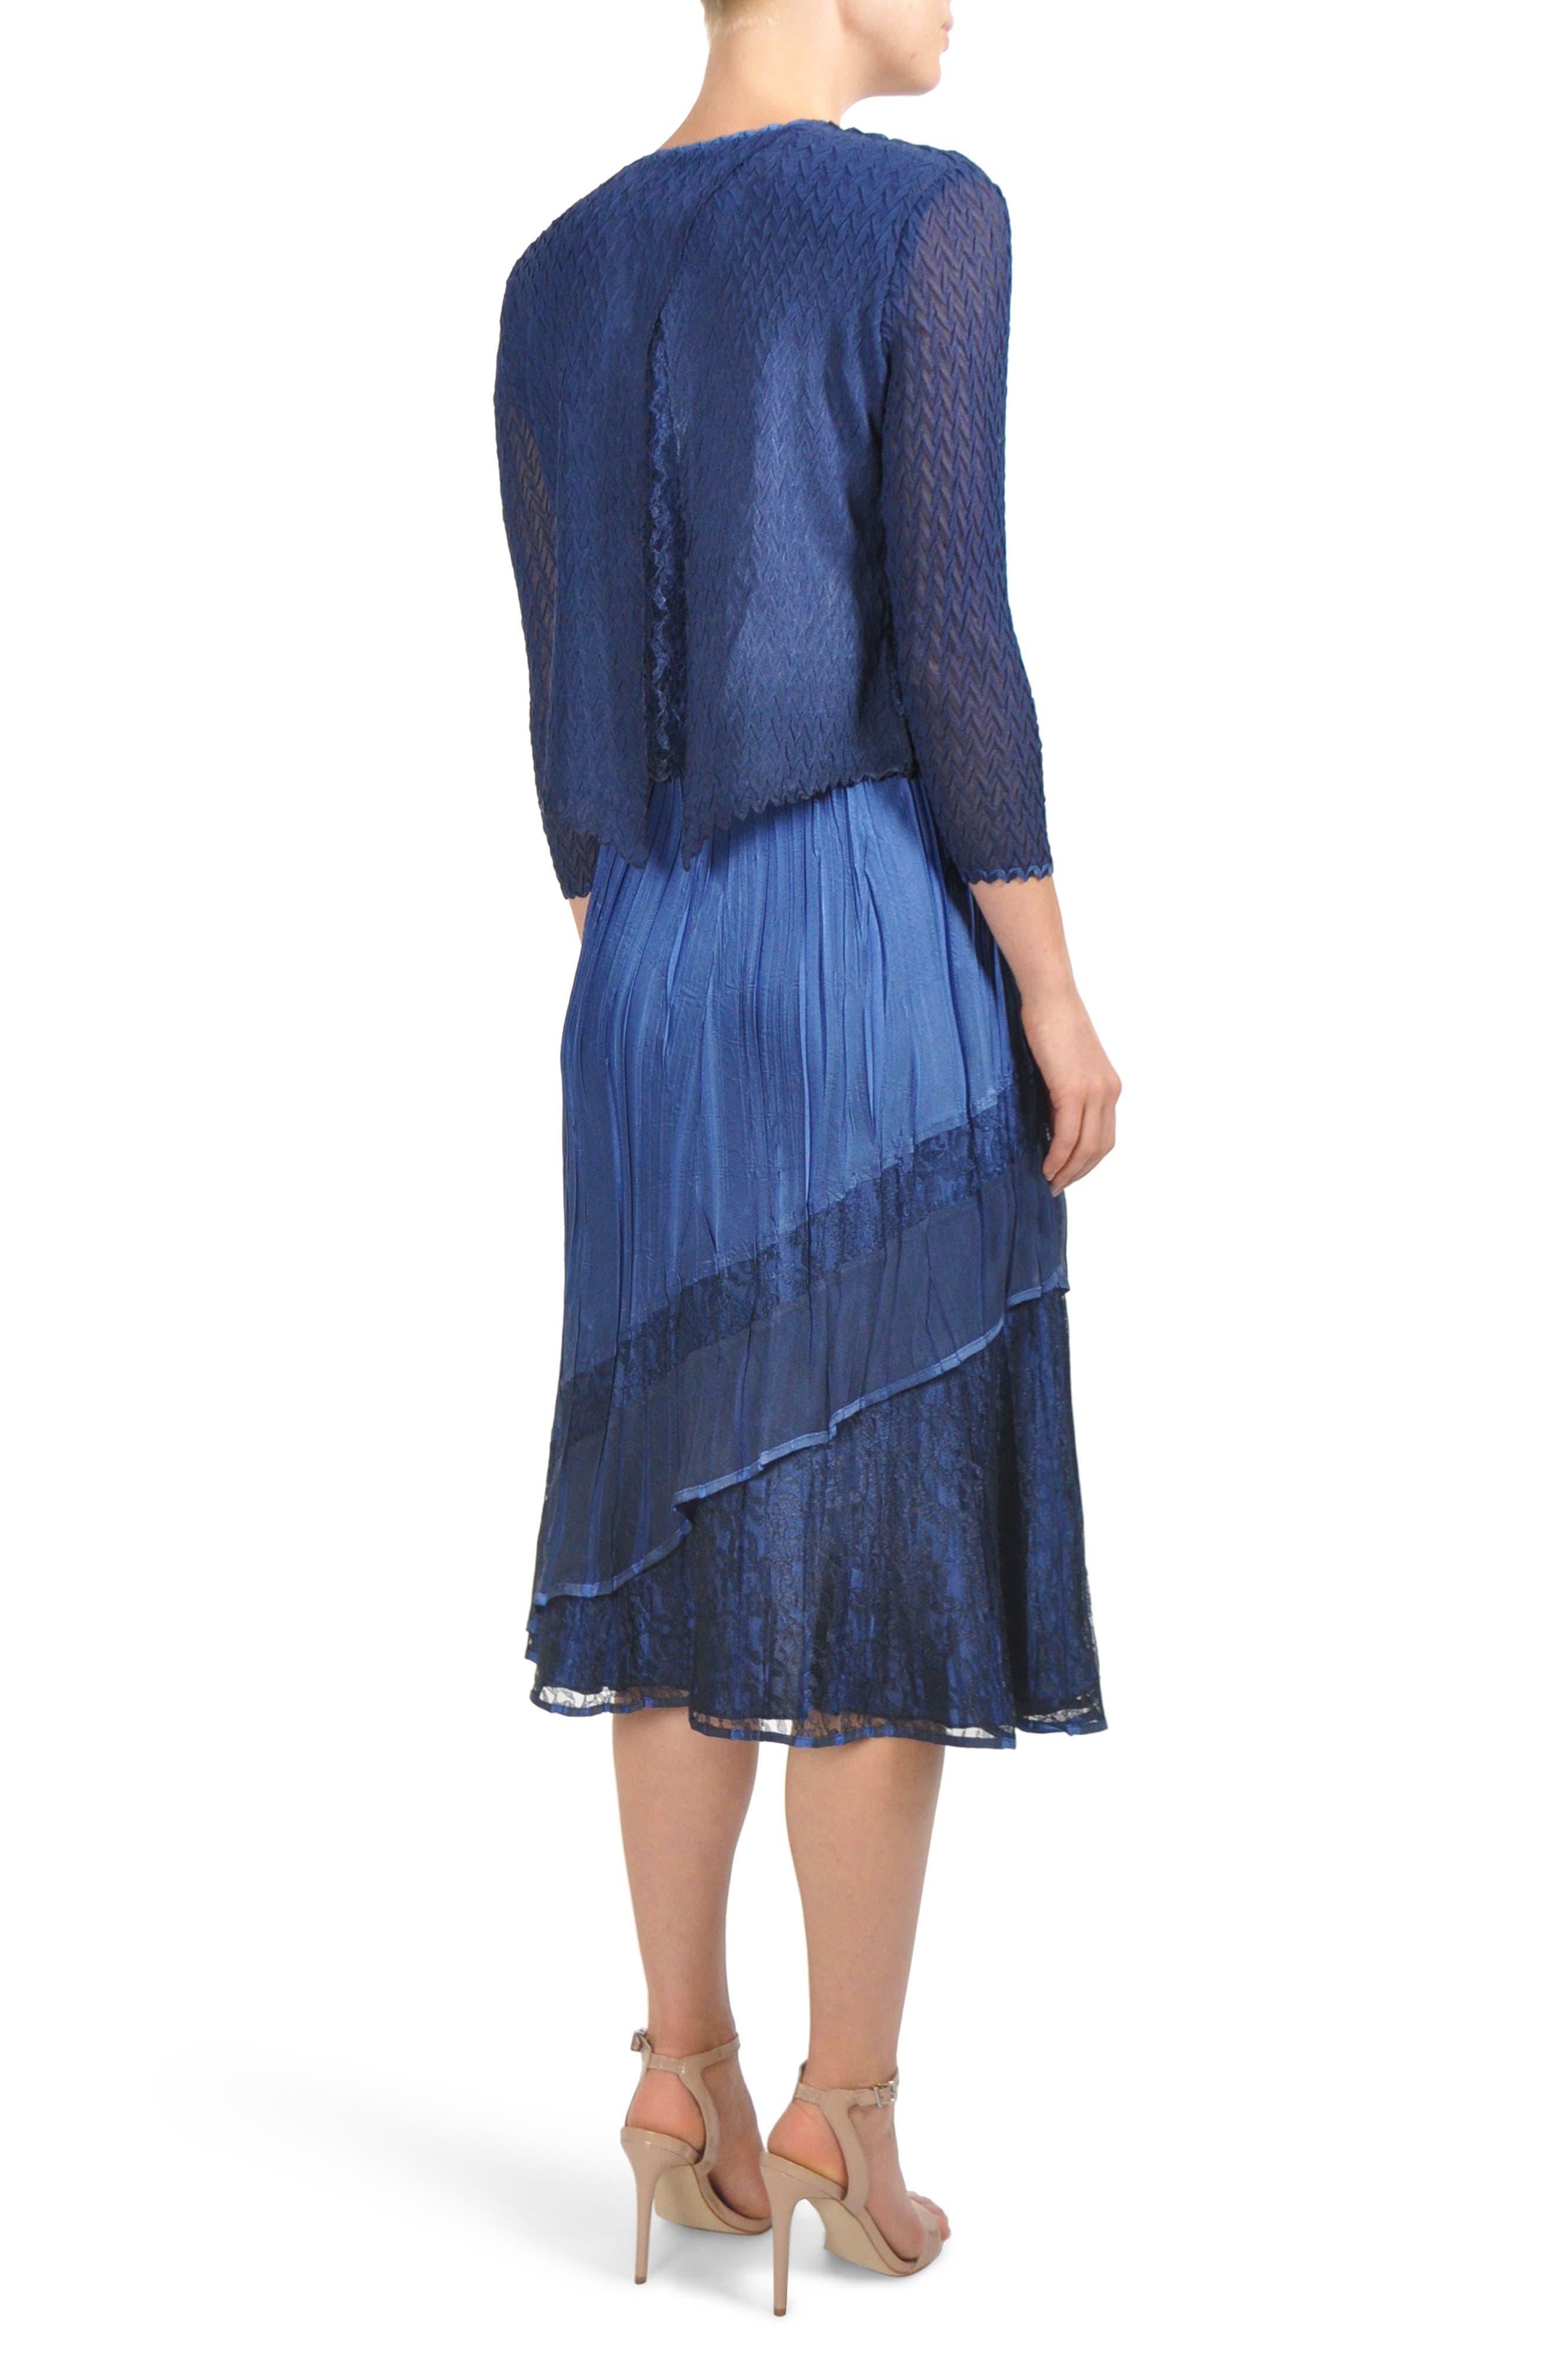 Komorov Midi Dress with Jacket,                             Alternate thumbnail 2, color,                             484